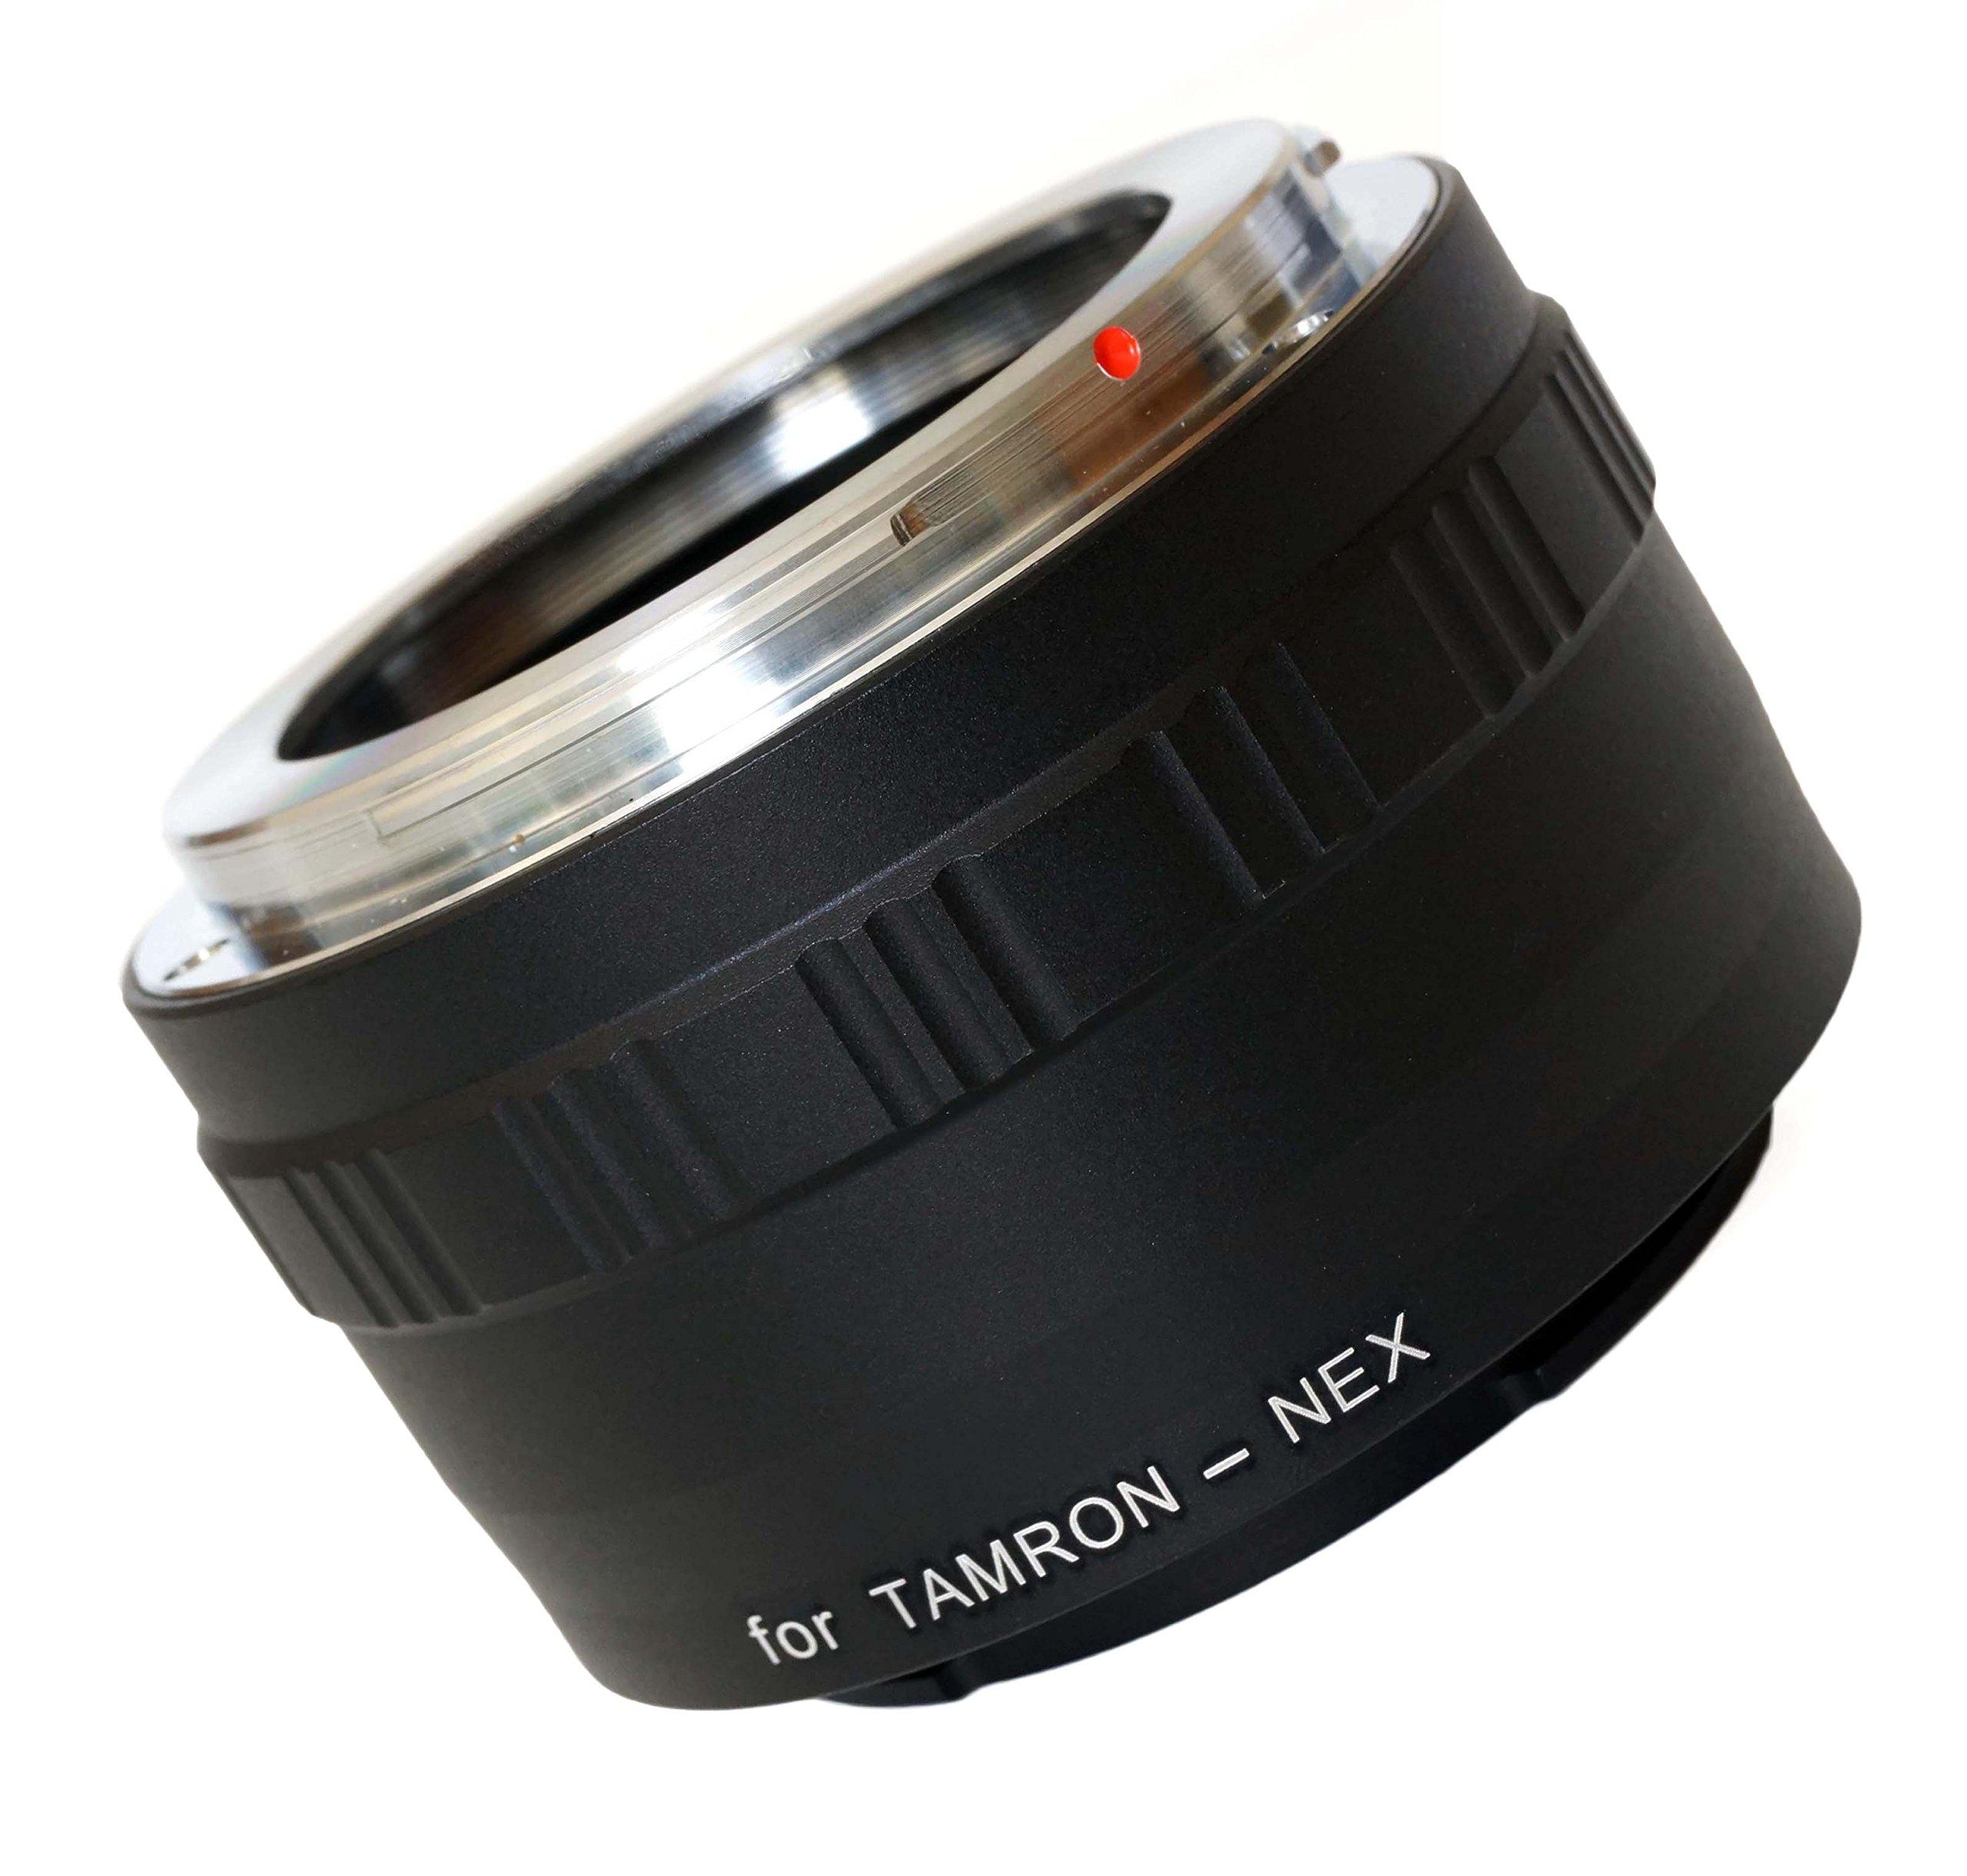 TAMRON Adaptall lente per Sony NEX E-Mount Adattatore (per NEX-3NEX-5NEX-6NEX-7ecc)